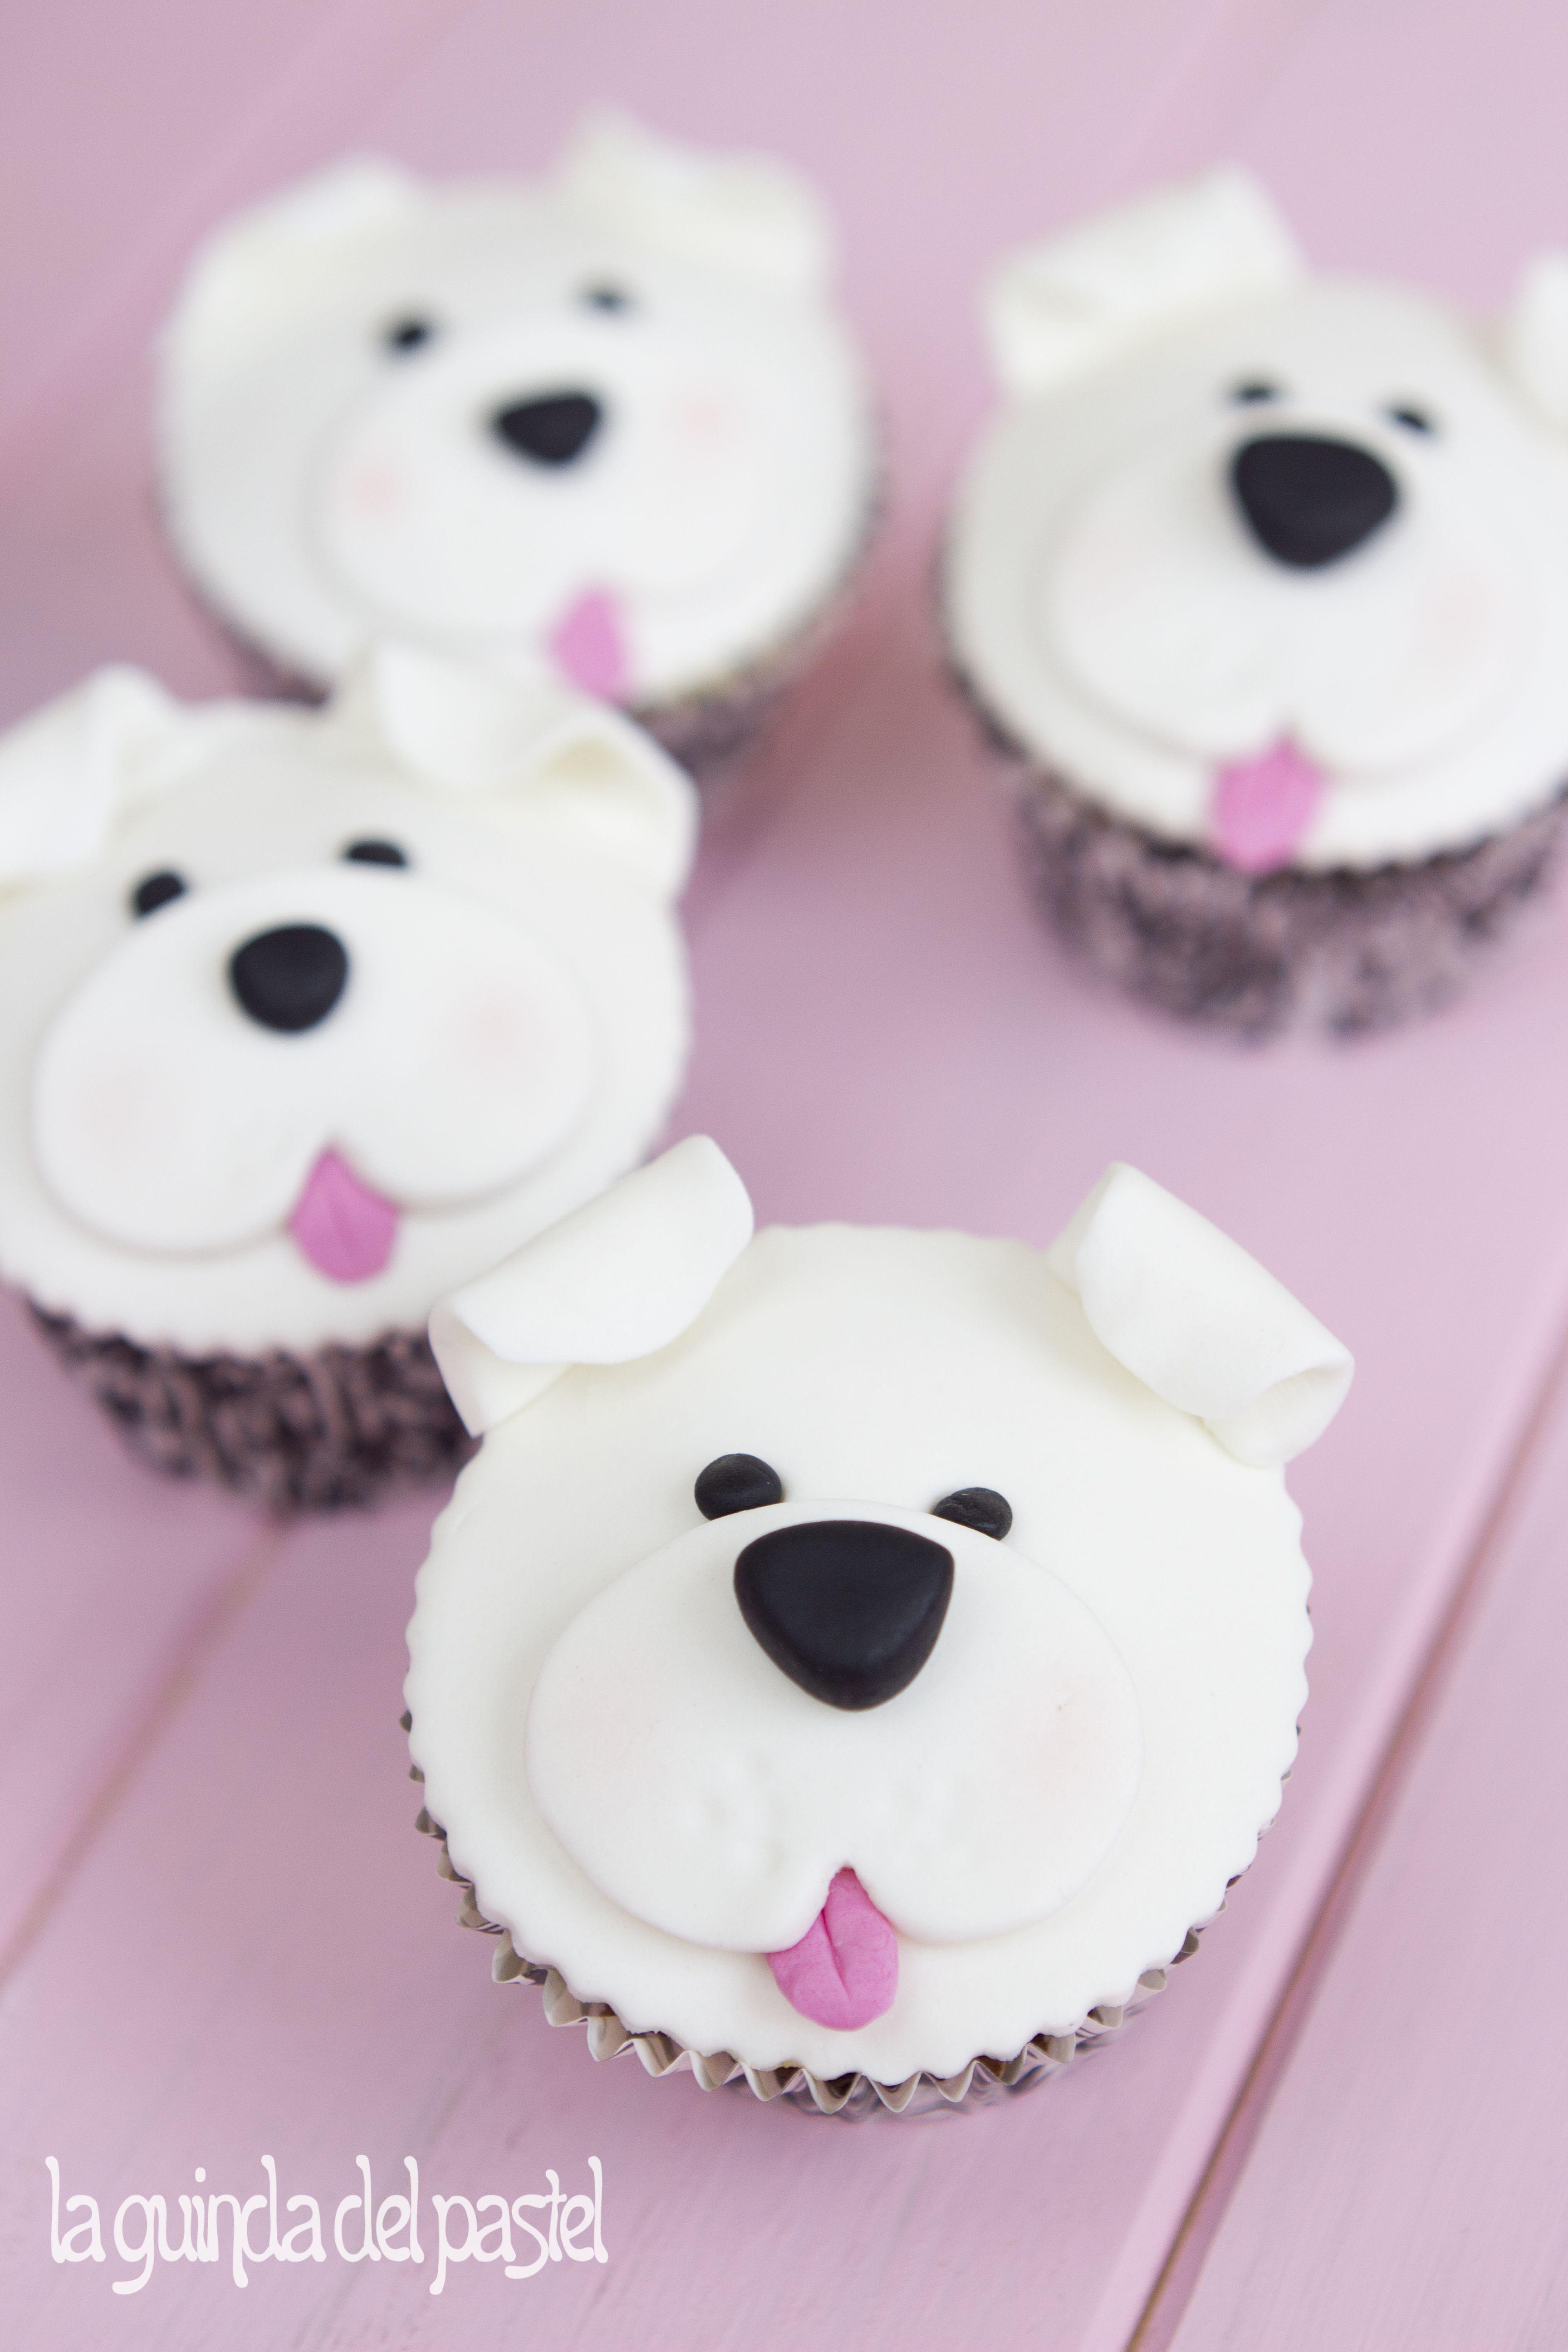 ... en fondant sobre cupcake. | Cupcakes | Pinterest | Cupcake and Fondant